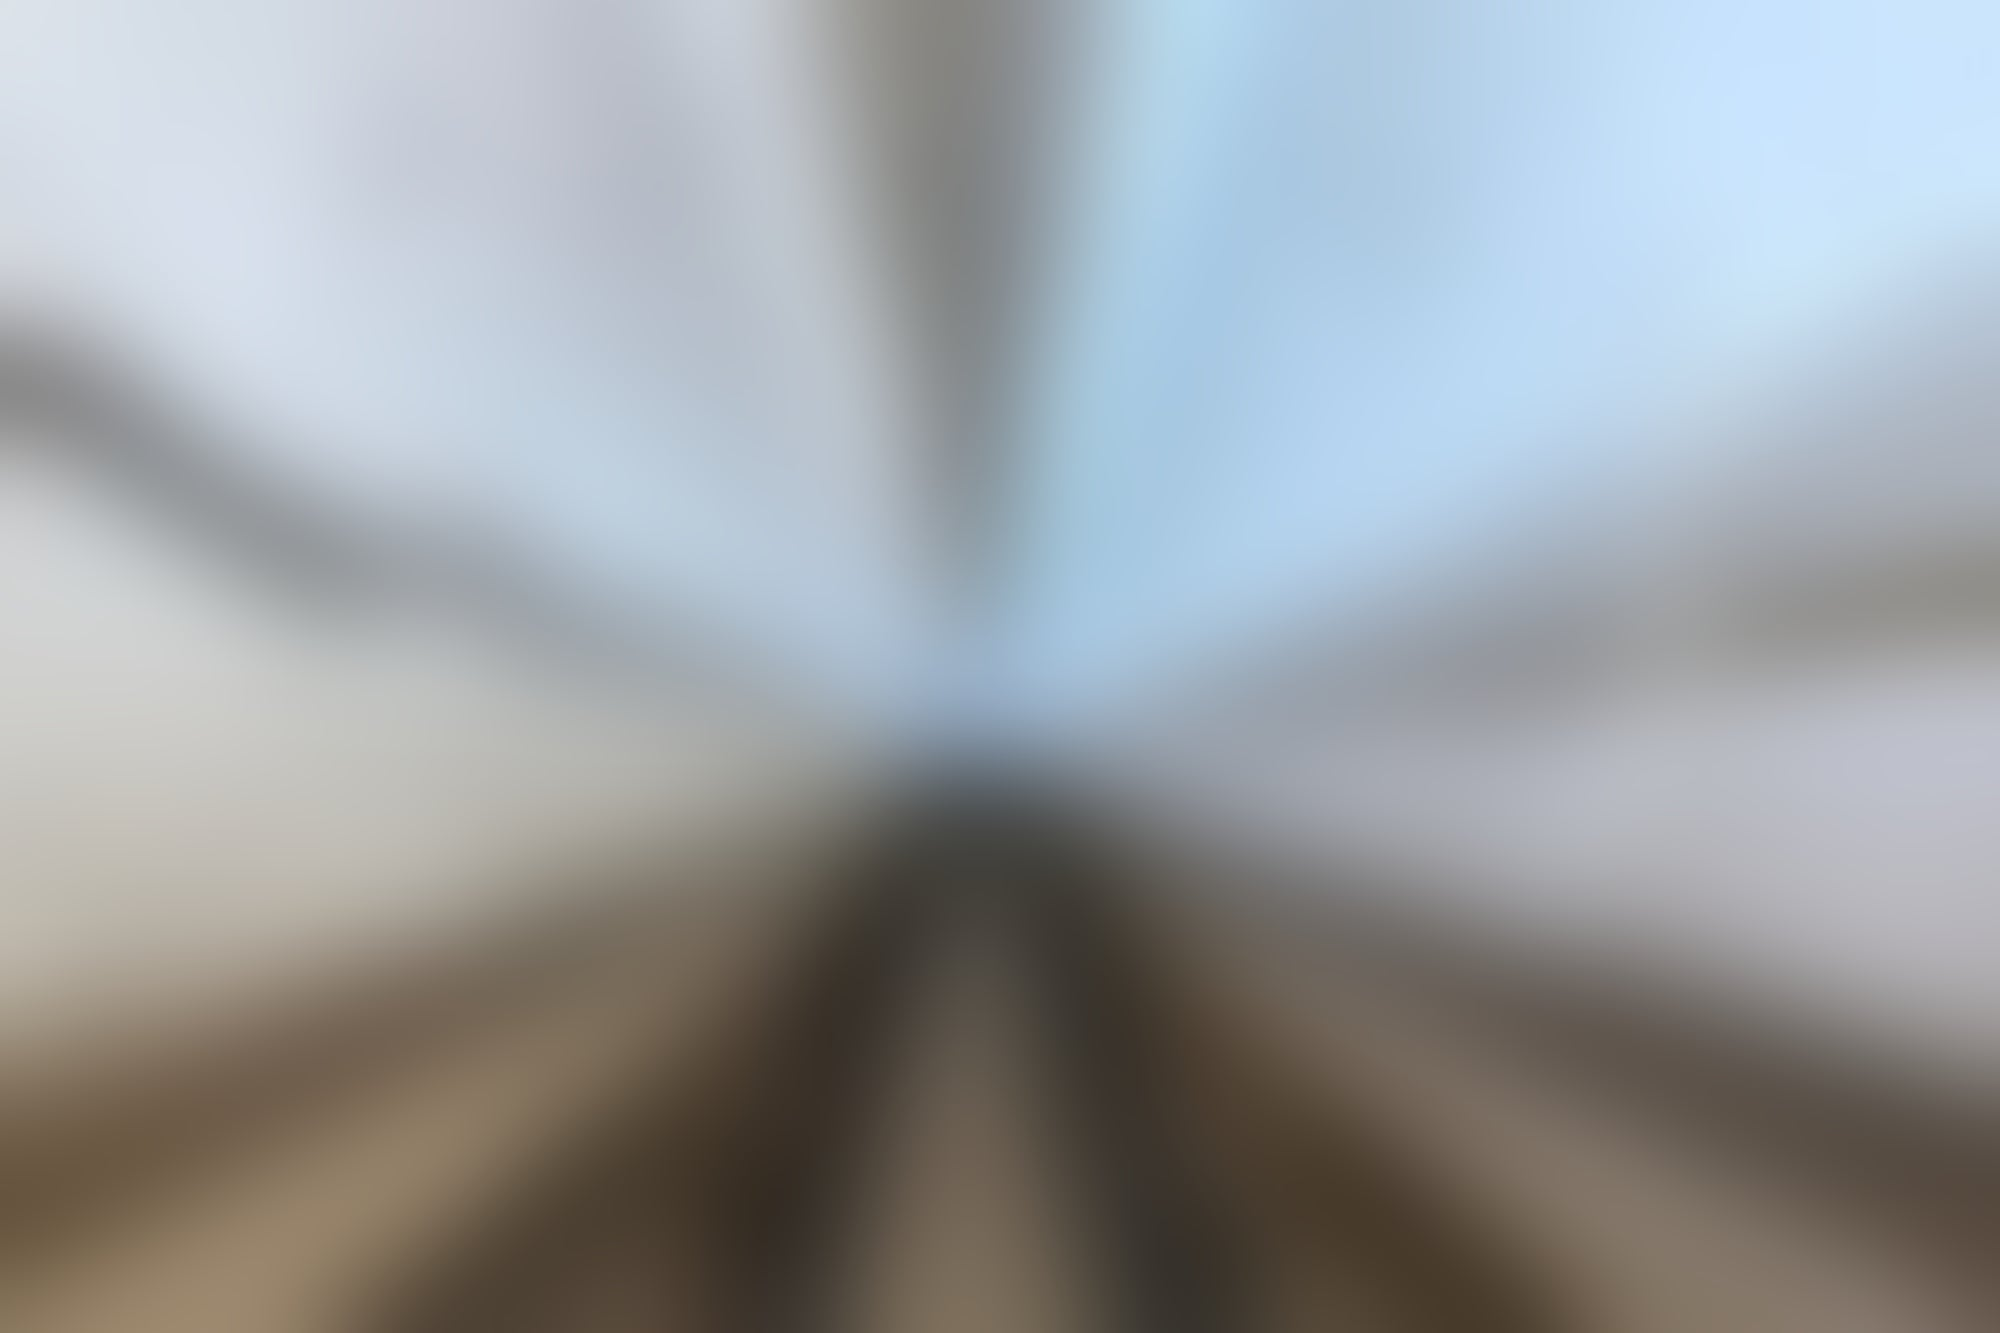 Elon Musk Walks Full Length of His Boring L.A. Tunnel